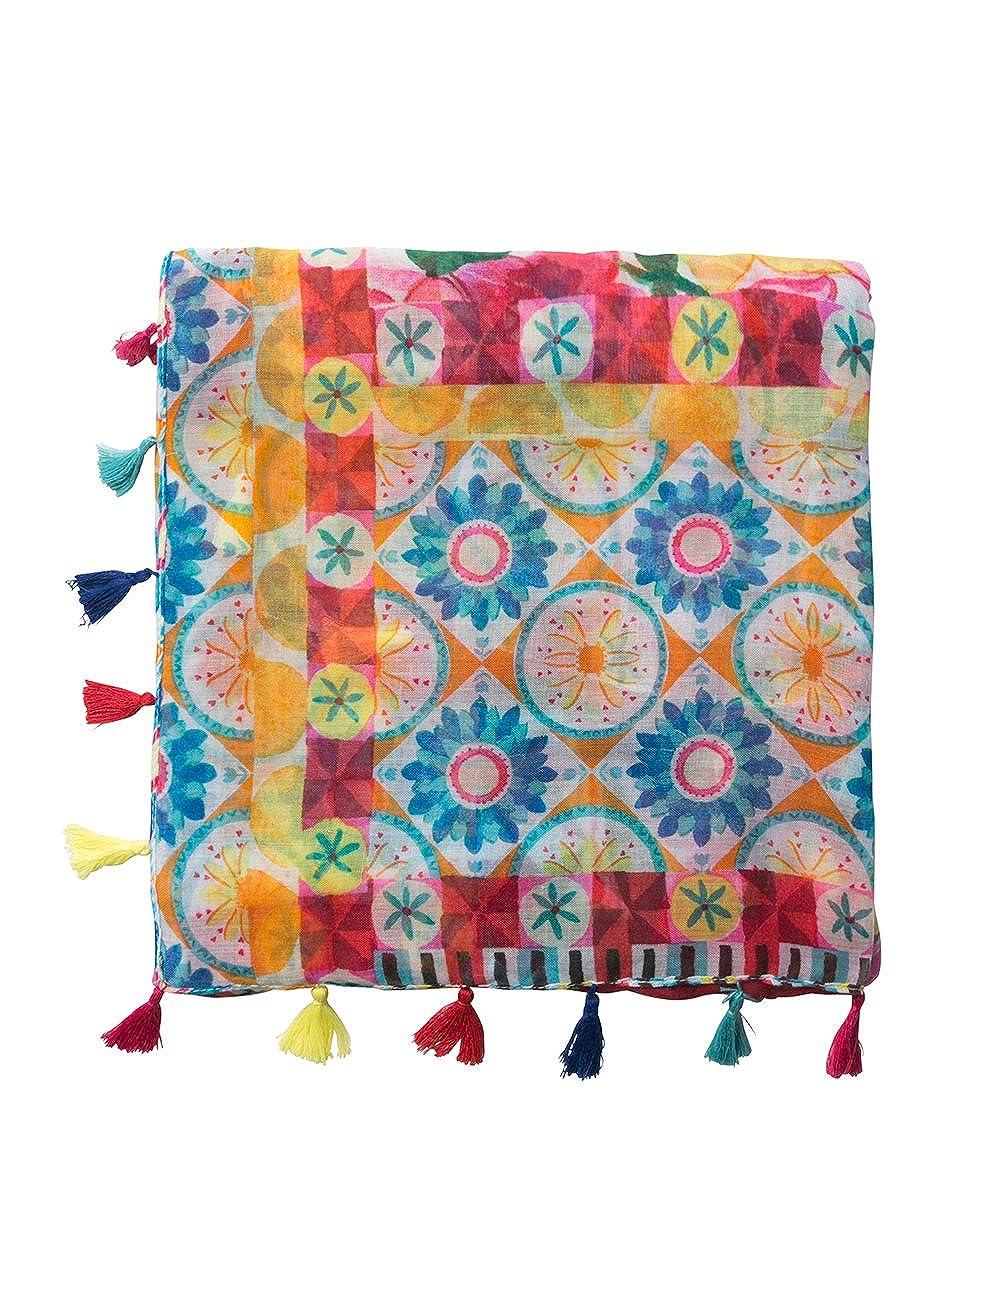 Fular Desigual Little Multicolor Desigual Foulard_Little Bufanda para Mujer Amarillo (Fresh Yellow 8023) 18SAWW608023U